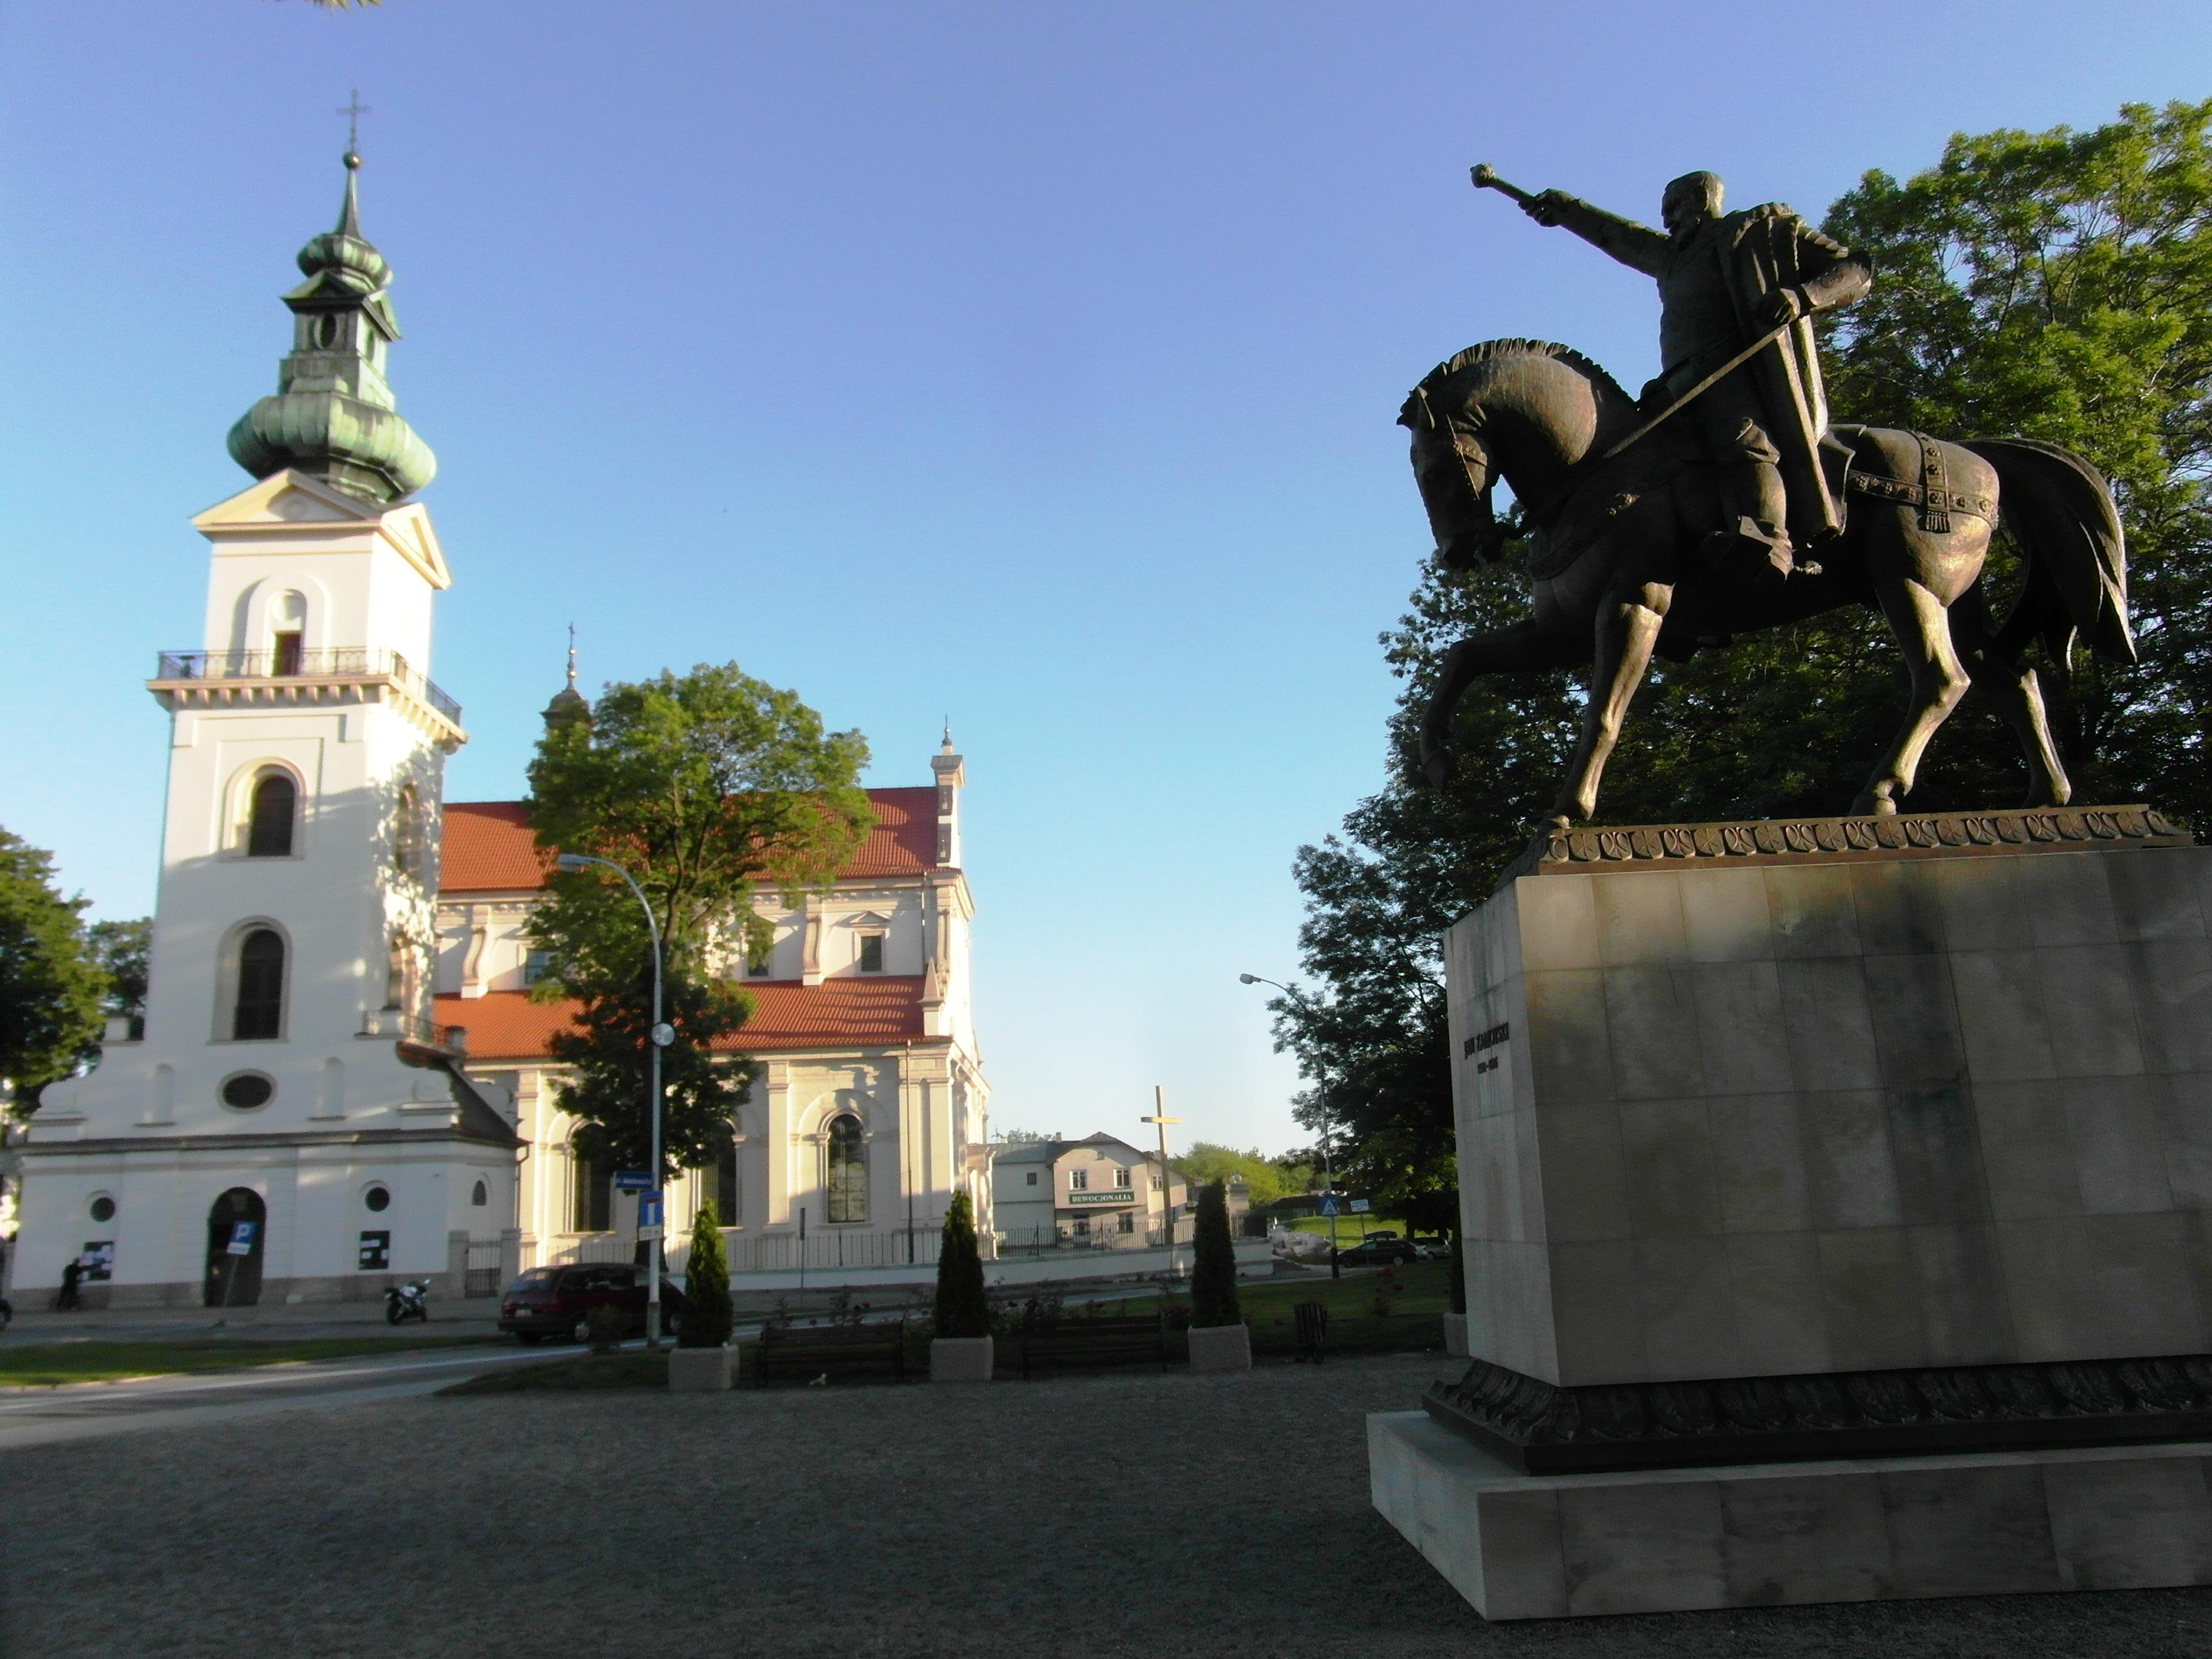 katerda i pomnik PZ.